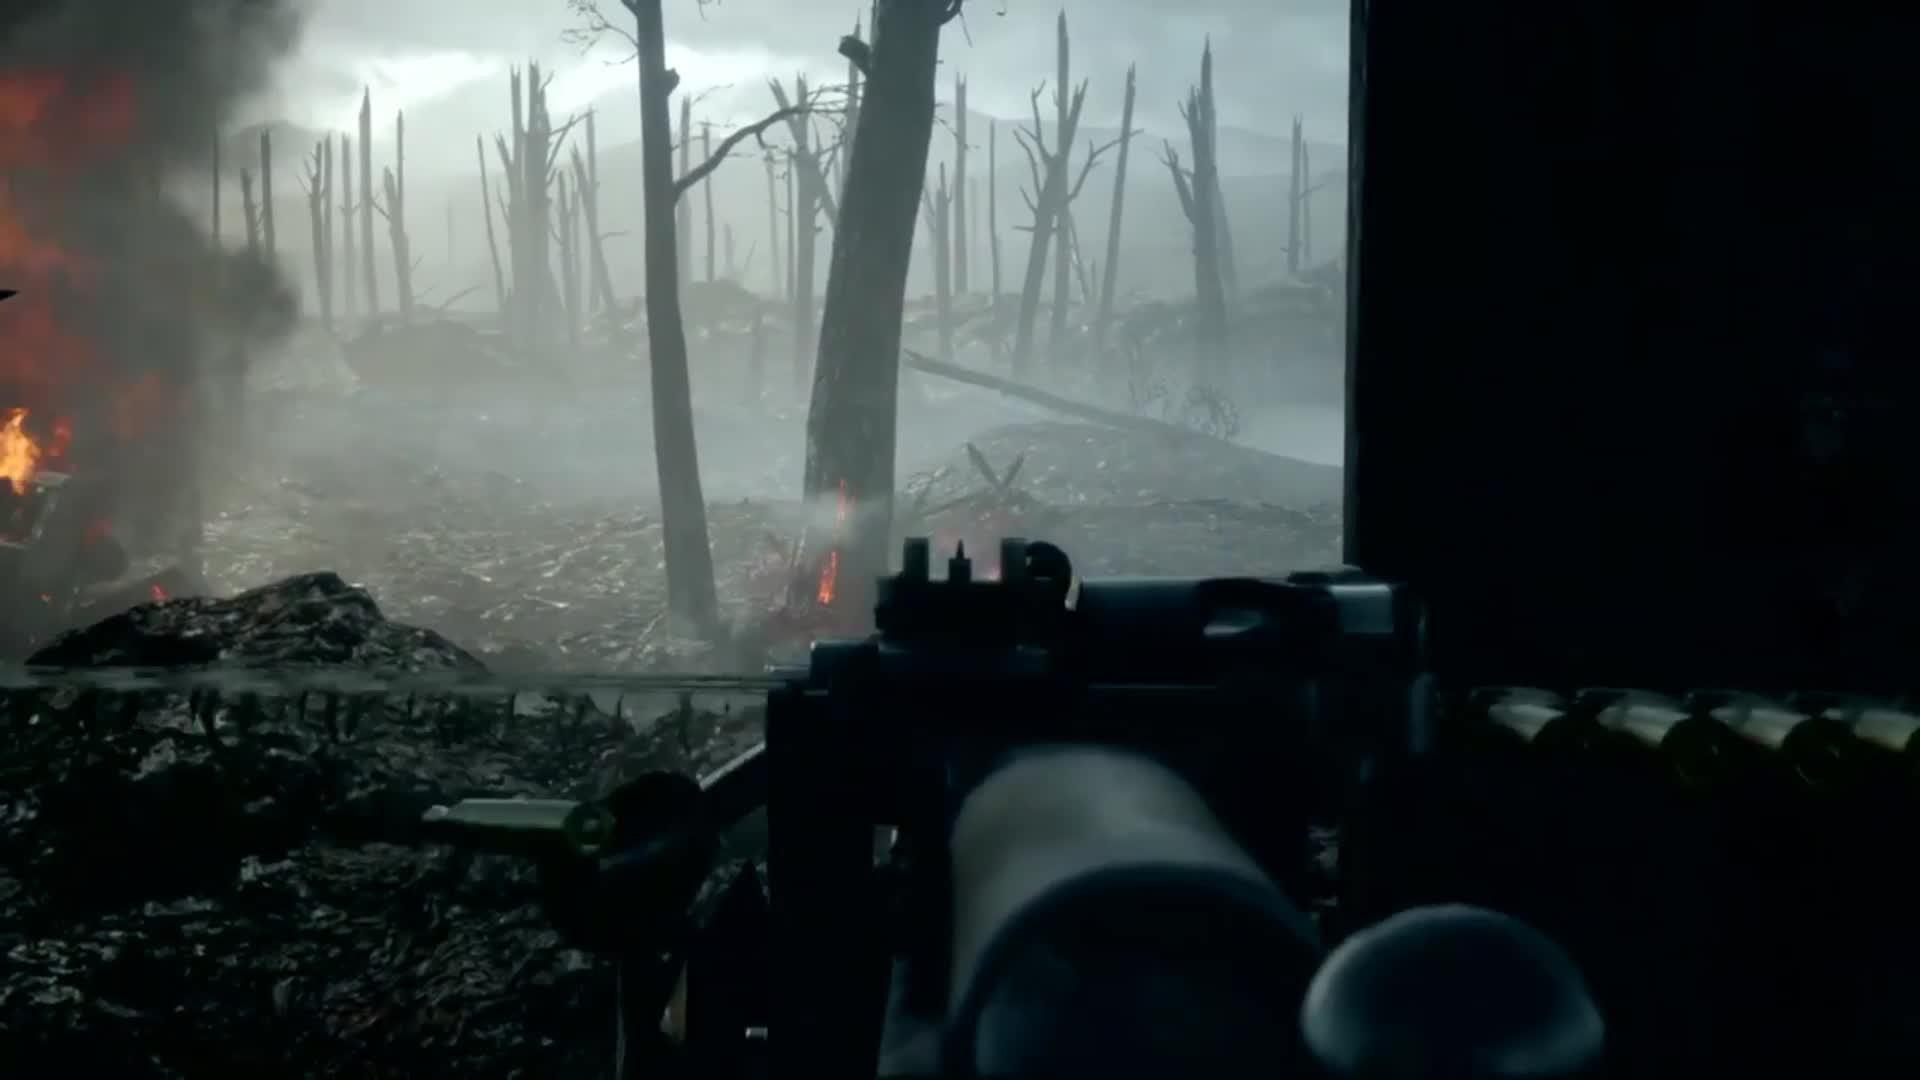 Battlefield: General - Battlefield 1 storm of steel hard , no hud video cover image 1